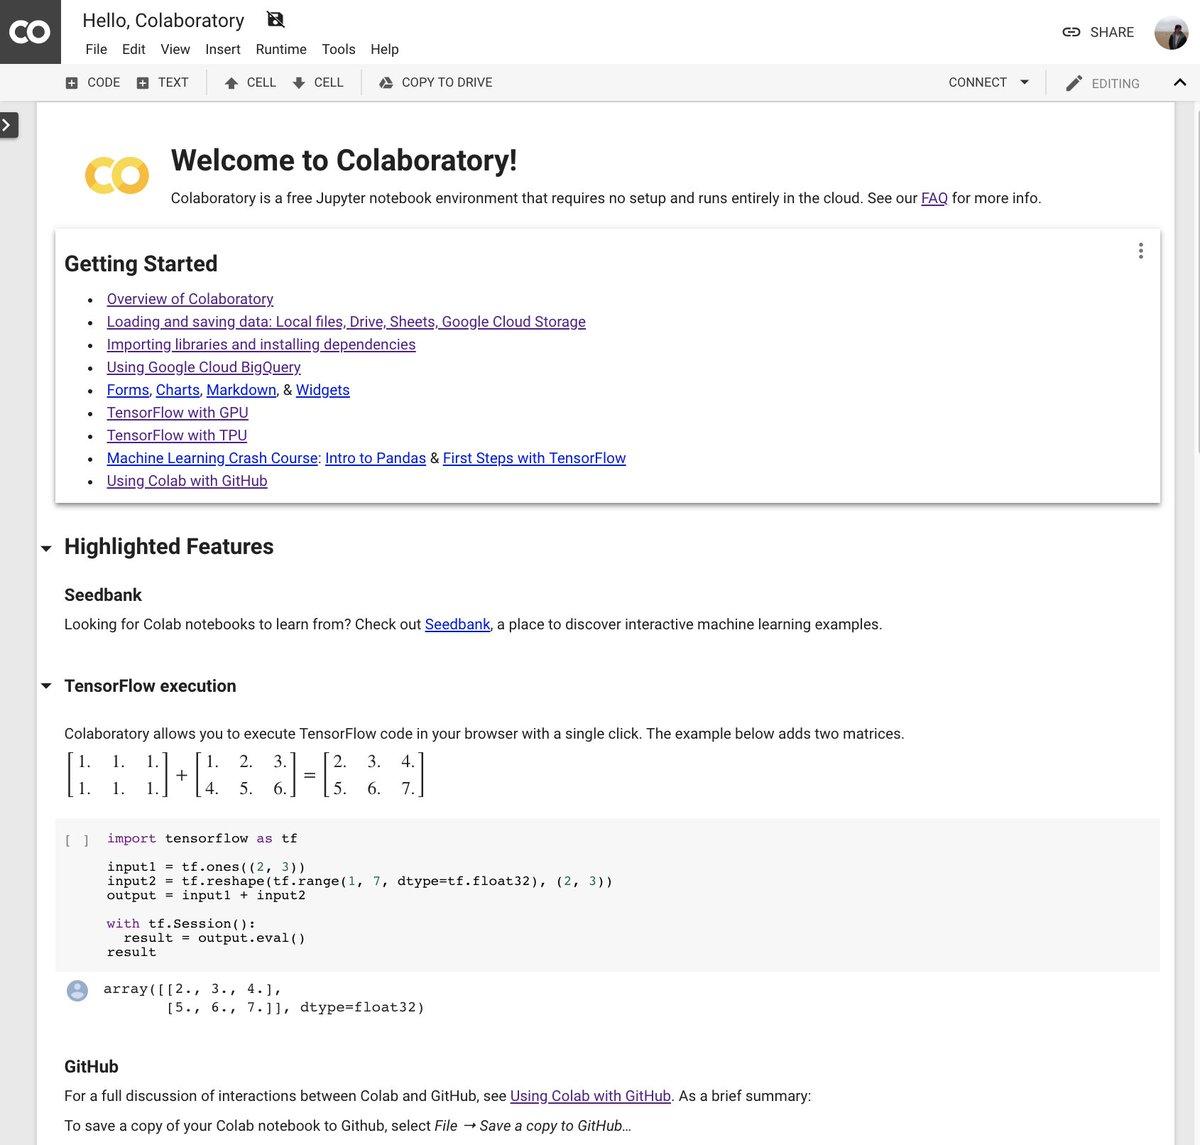 Google Machine Learning Crash Course Github - Quantum Computing